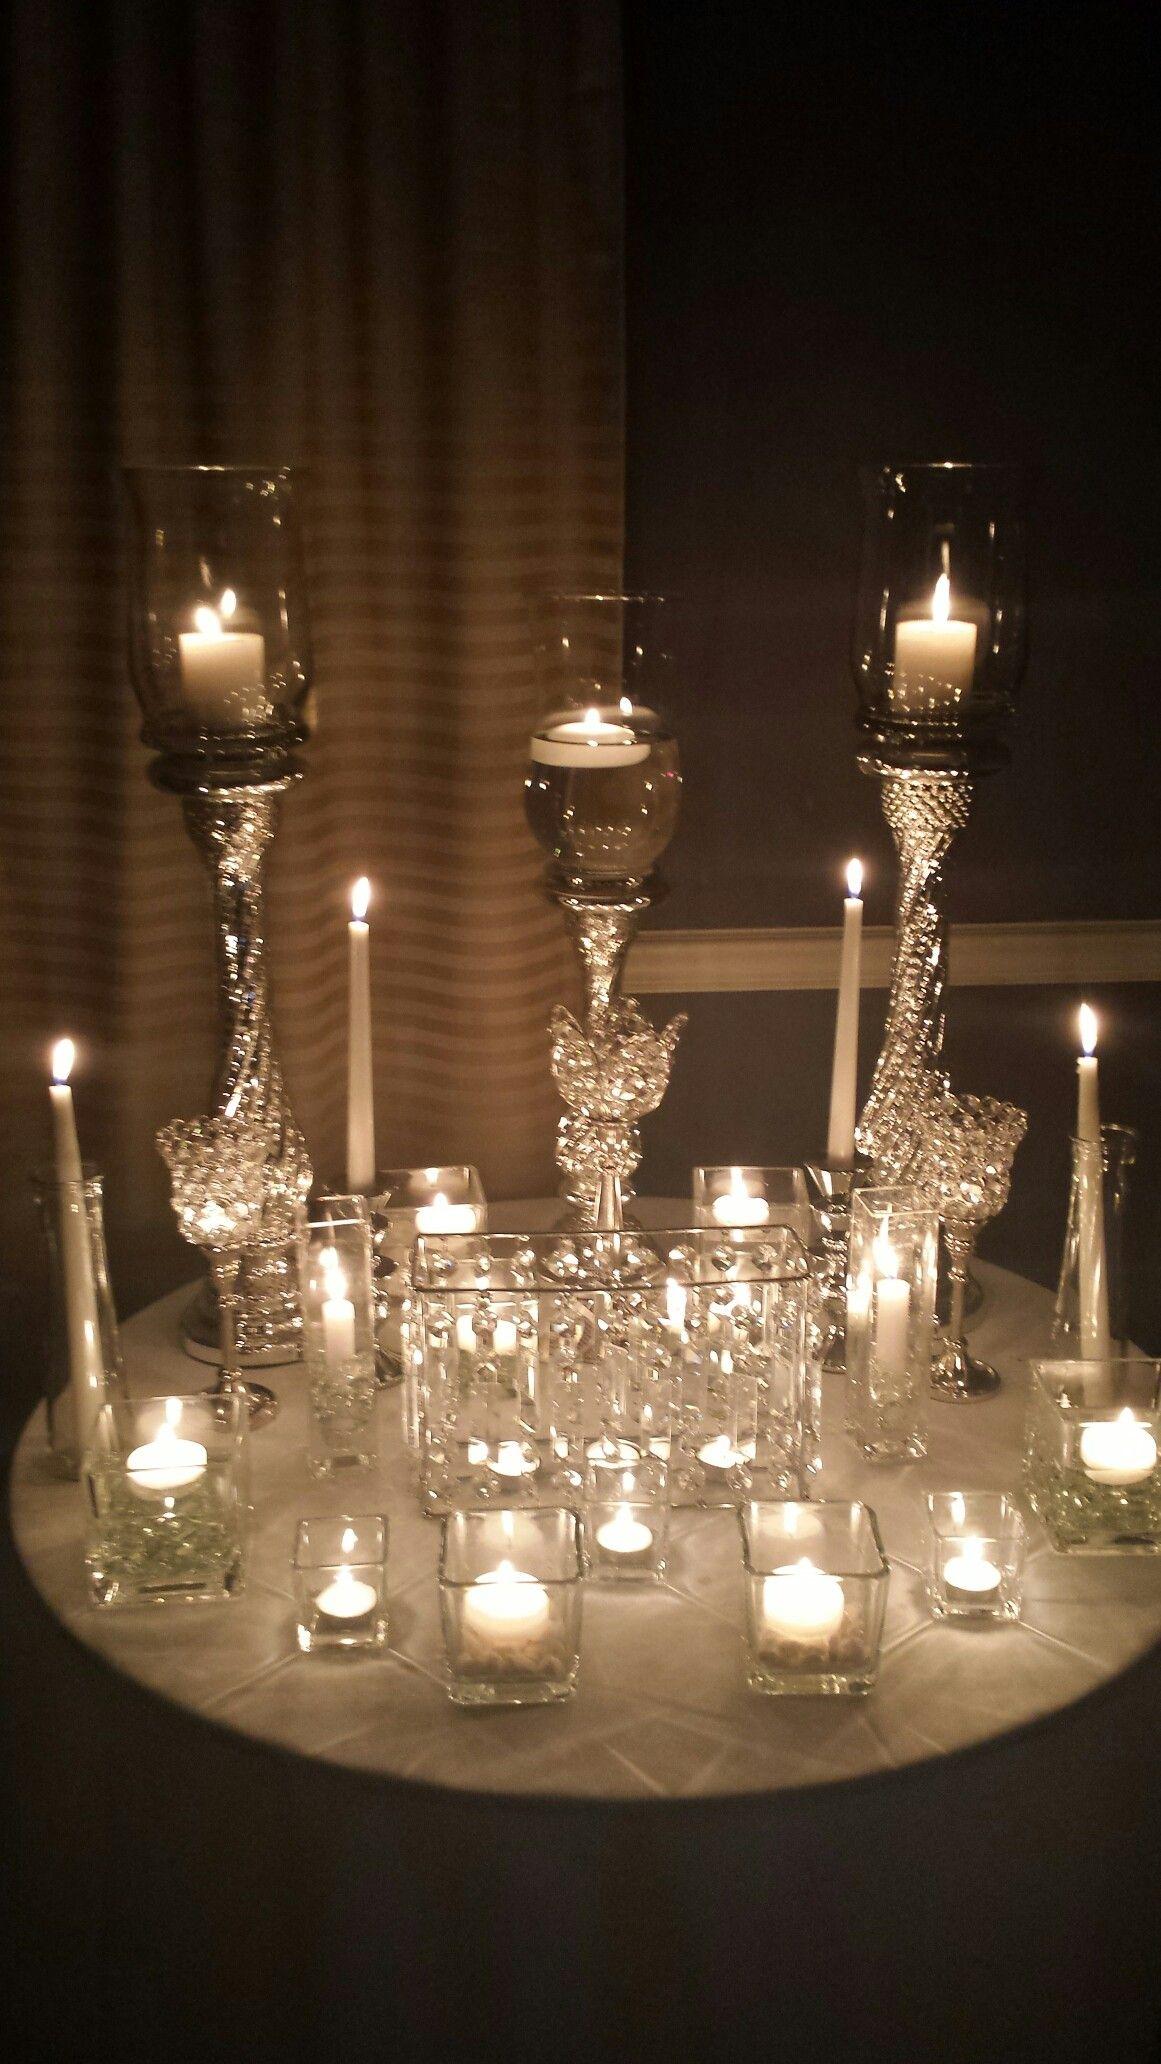 Wedding decor images  Candles Wedding Decor  Wedding Designs by DuW Premier Events